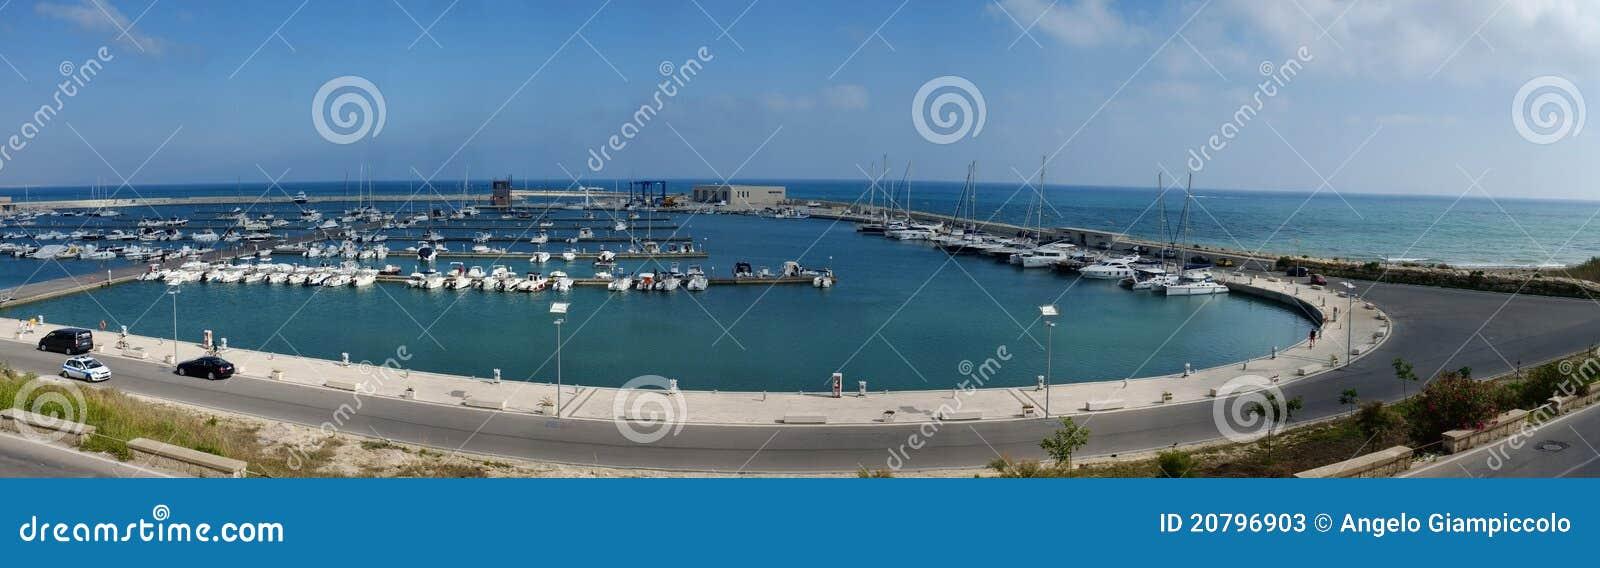 L Italie, Siciliy, la mer Méditerranée, marina